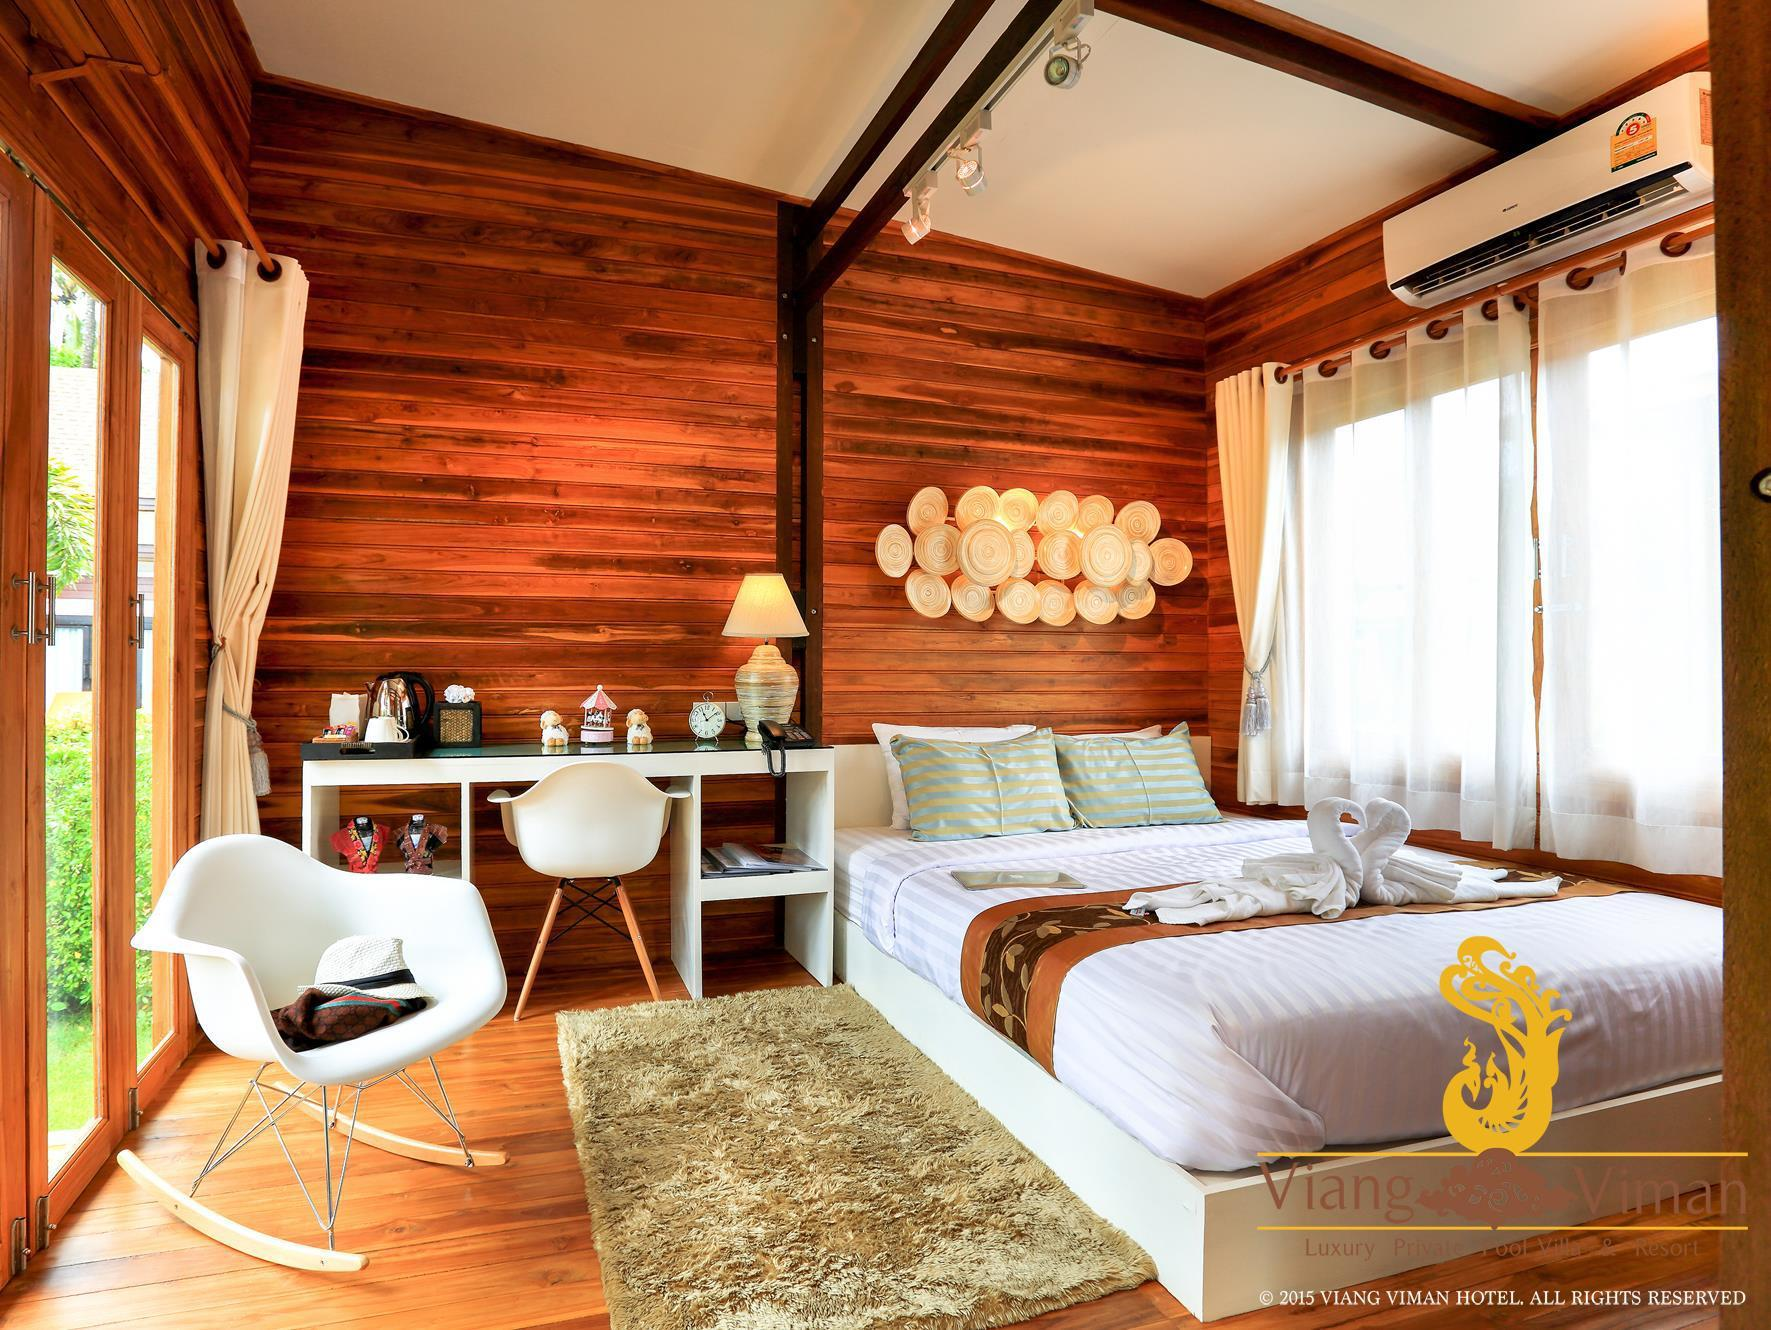 Viangviman Luxury Private Pool Villa and Resort เวียงวิมาน ลักซัวรี ไพรเวท พูลวิลล่า แอนด์ รีสอร์ท